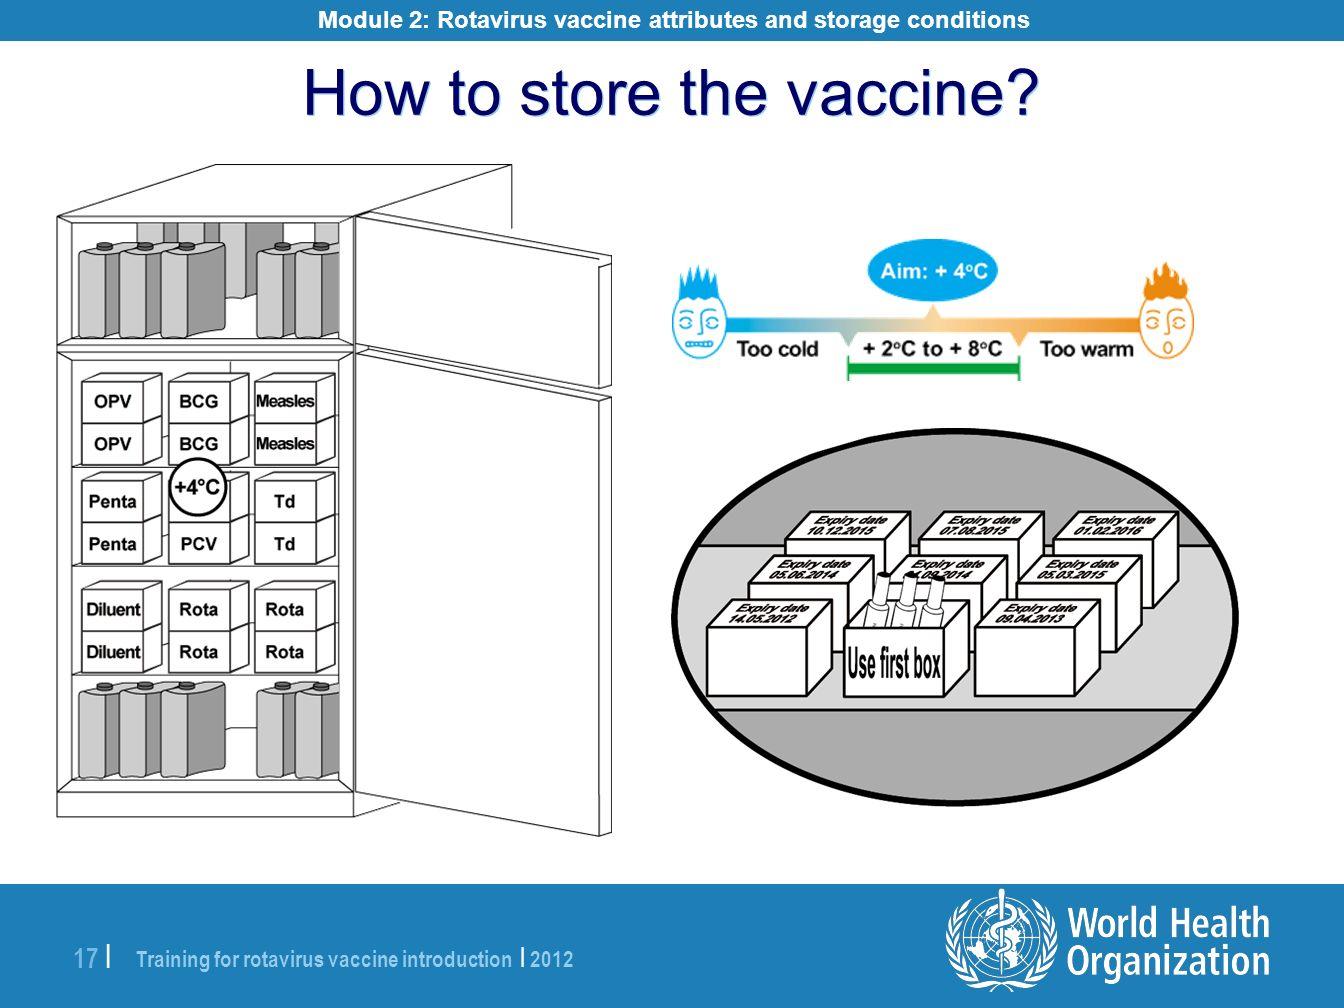 Module 2: Rotavirus vaccine attributes and storage conditions